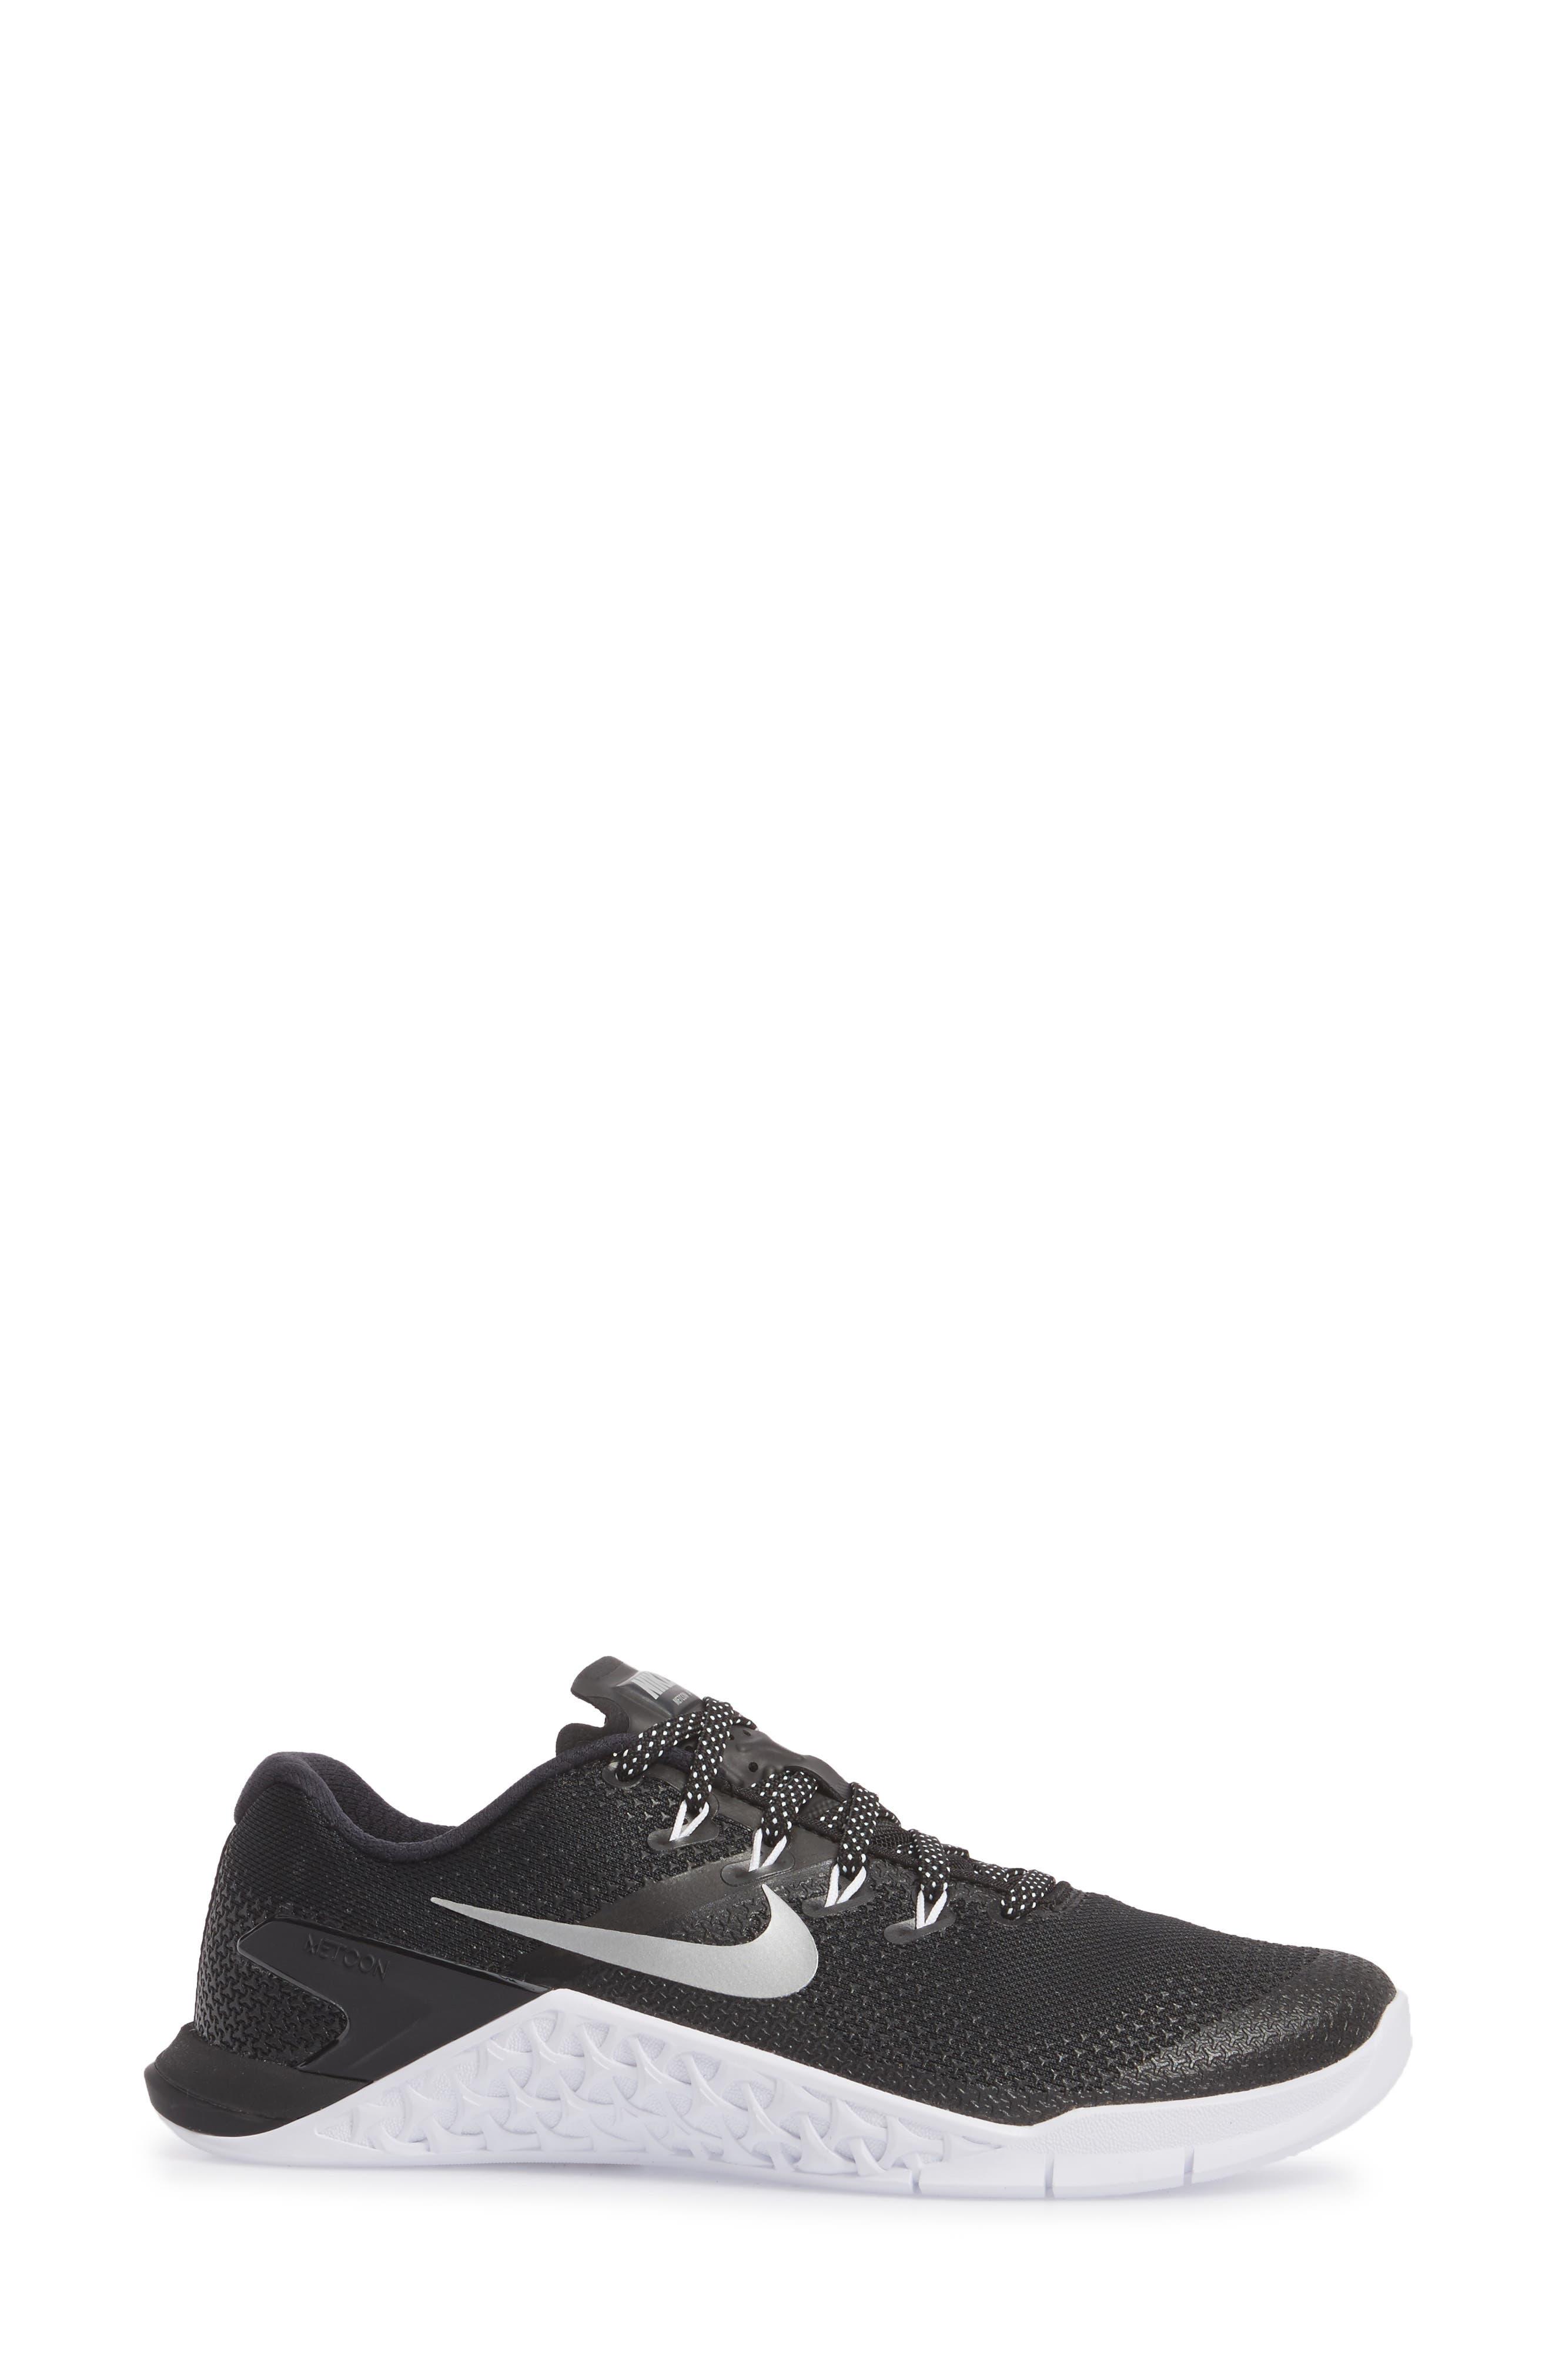 Metcon 4 Training Shoe,                             Alternate thumbnail 17, color,